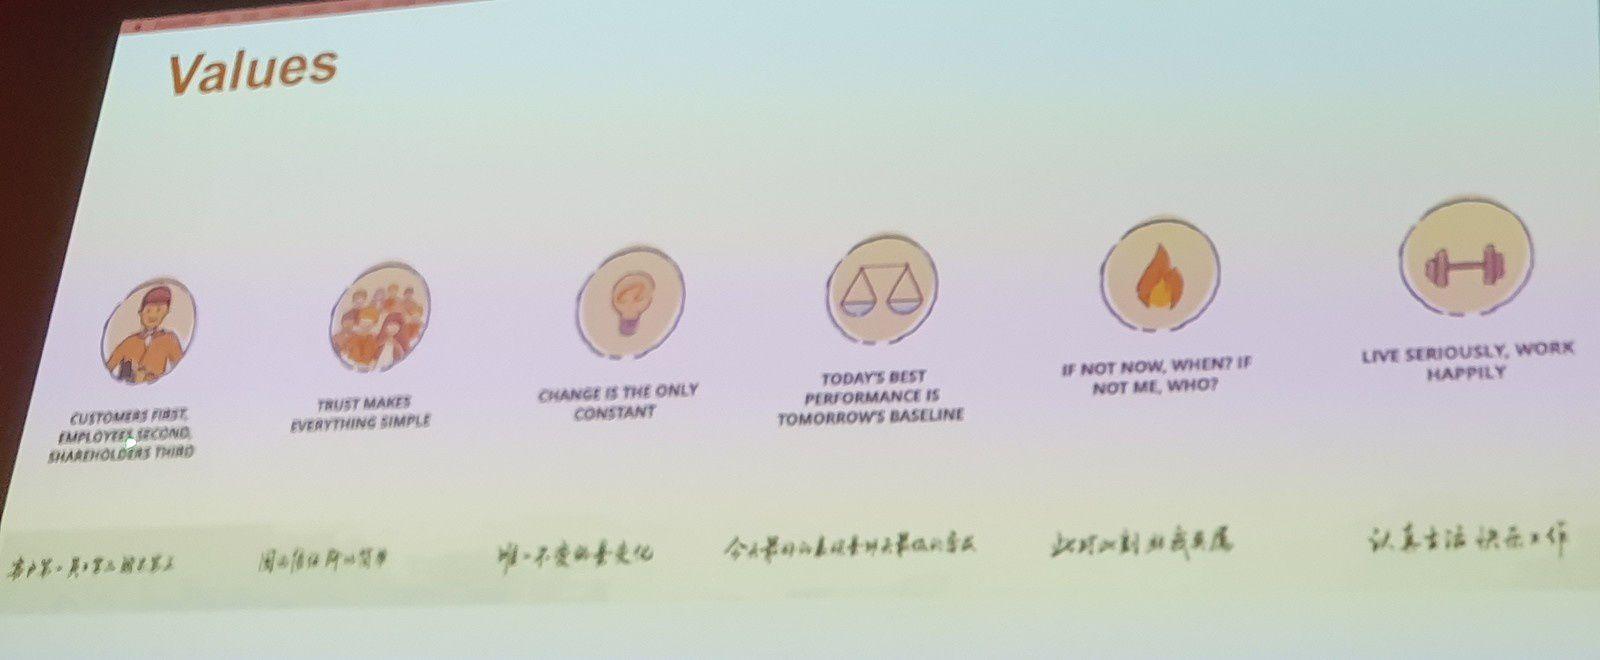 Decoding Alibaba: les 6 valeurs fondamentales du groupe Alibaba.